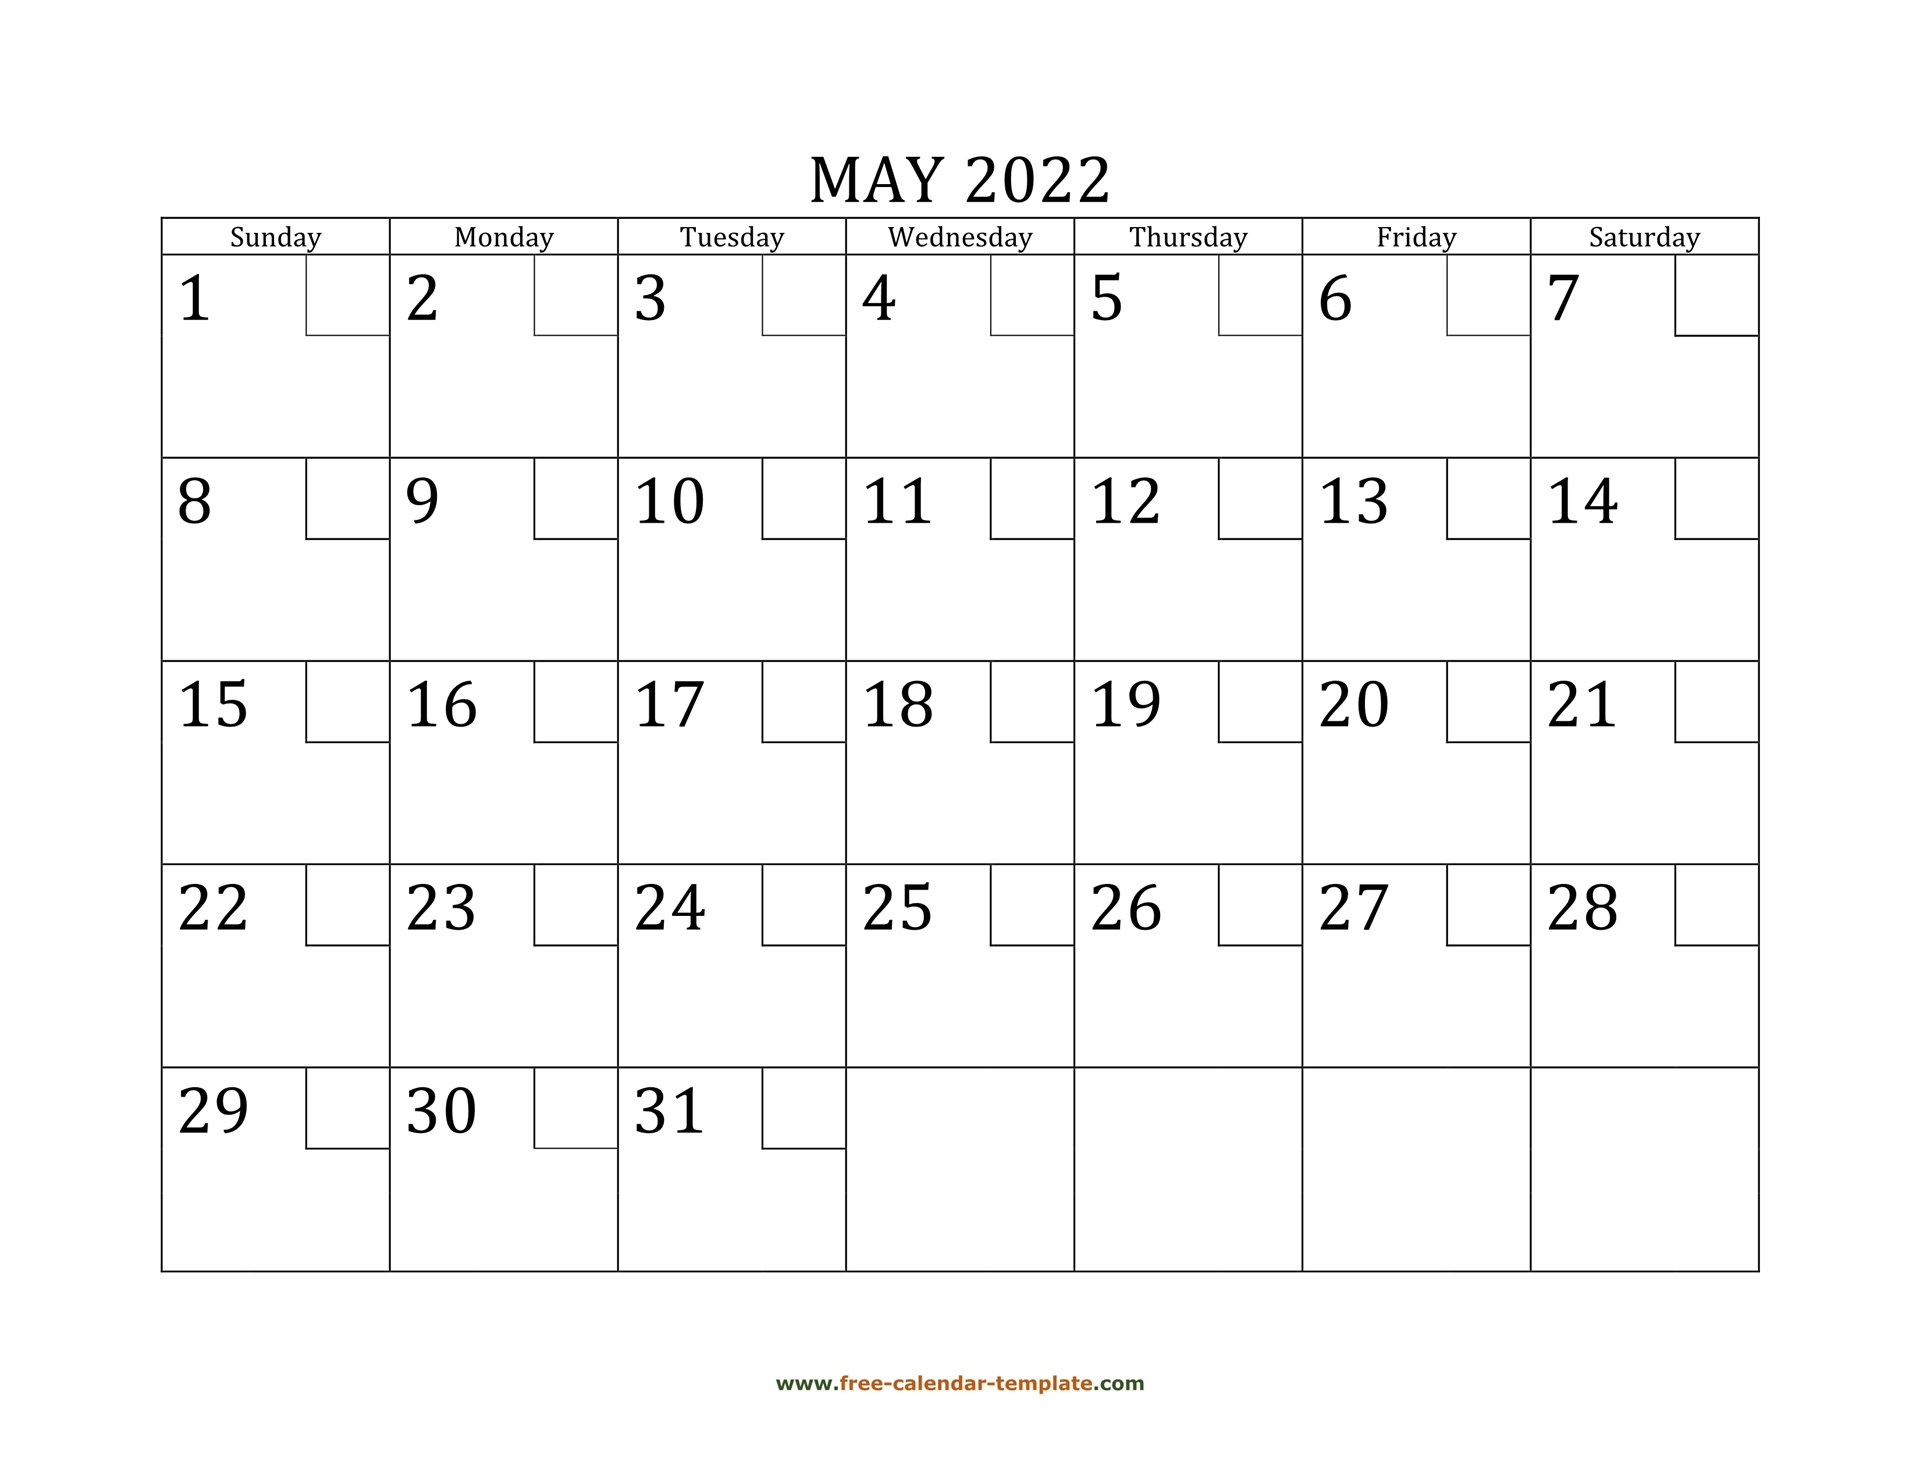 May 2022 Free Calendar Tempplate   Free-Calendar-Template pertaining to Printable Mayl 2022 Calendar